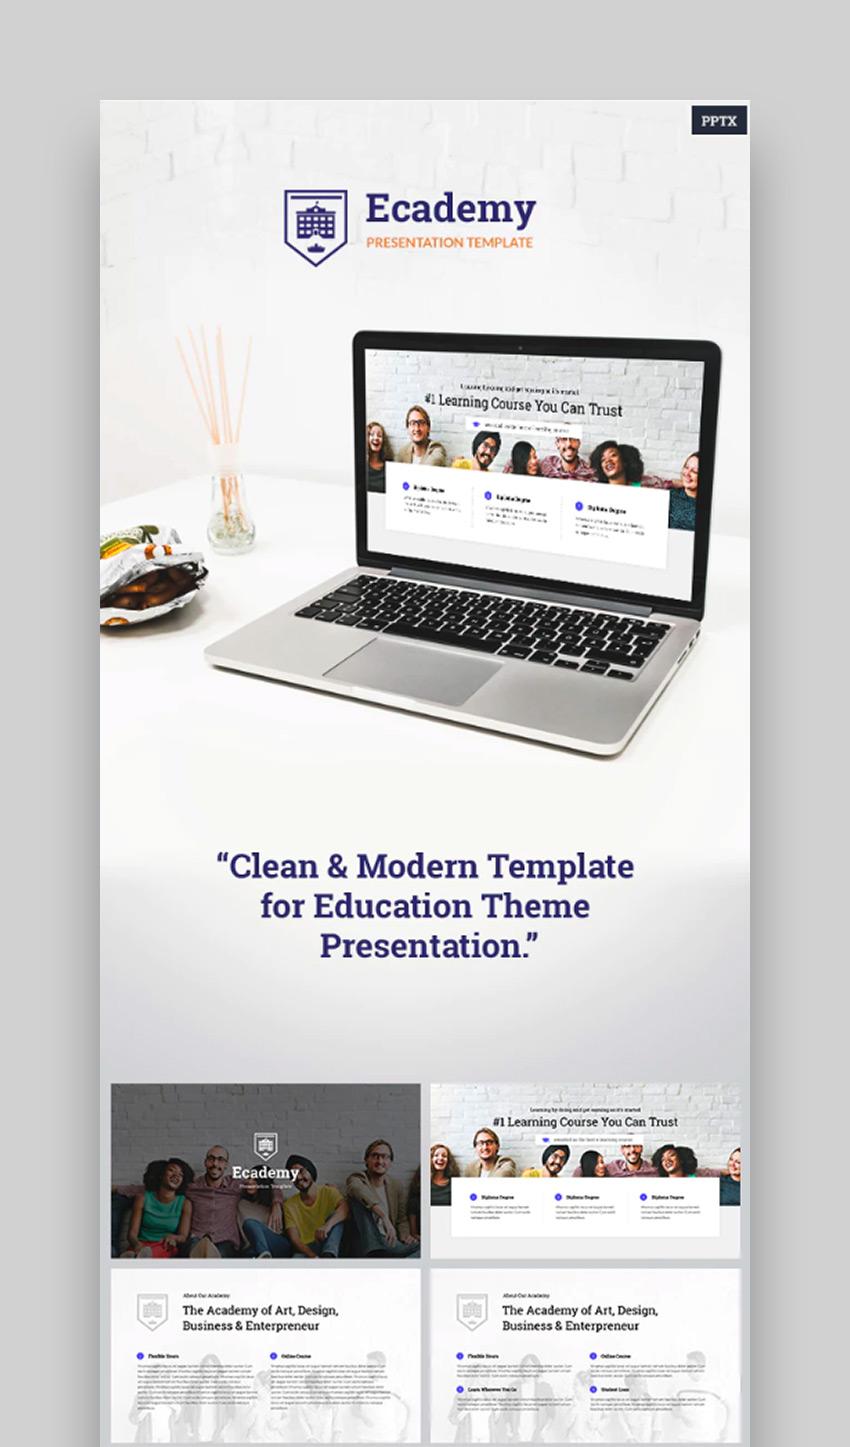 Ecademy - Powerpoint Template